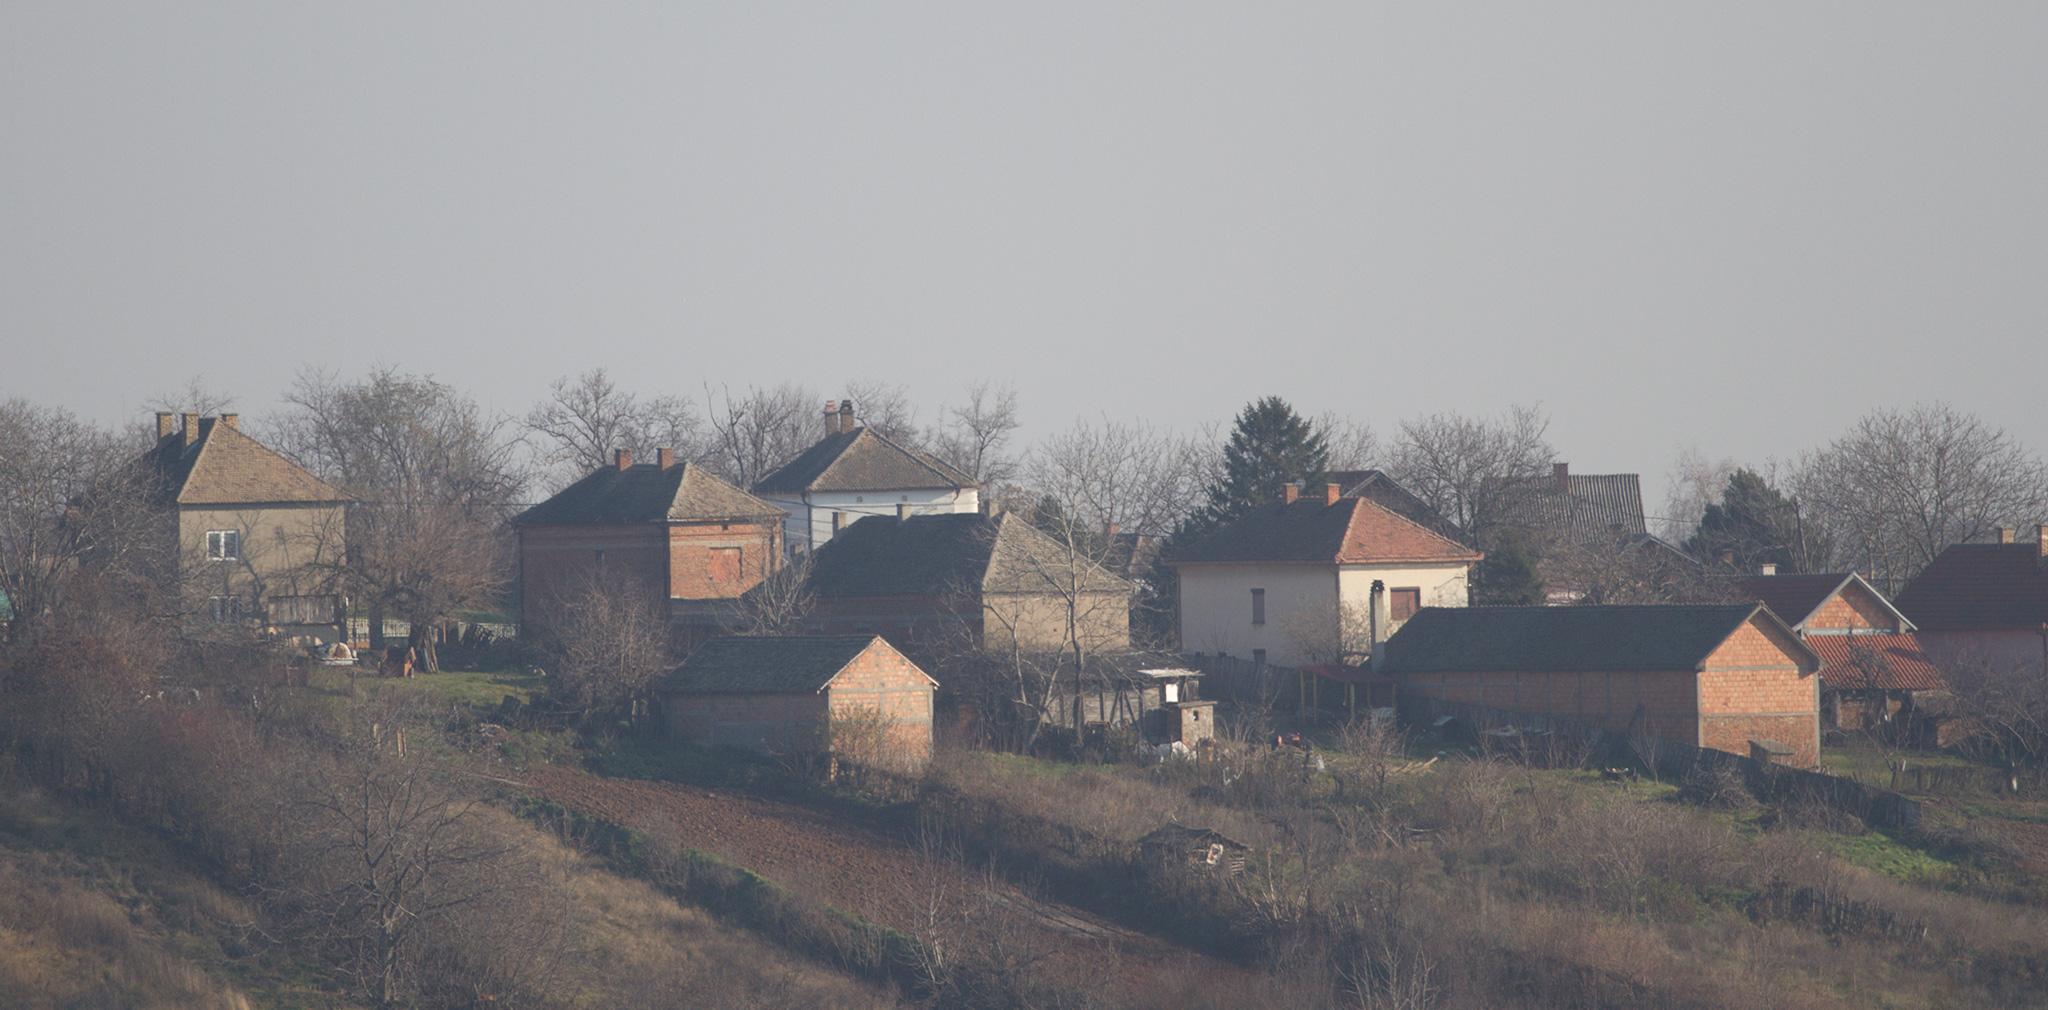 village-before.jpg